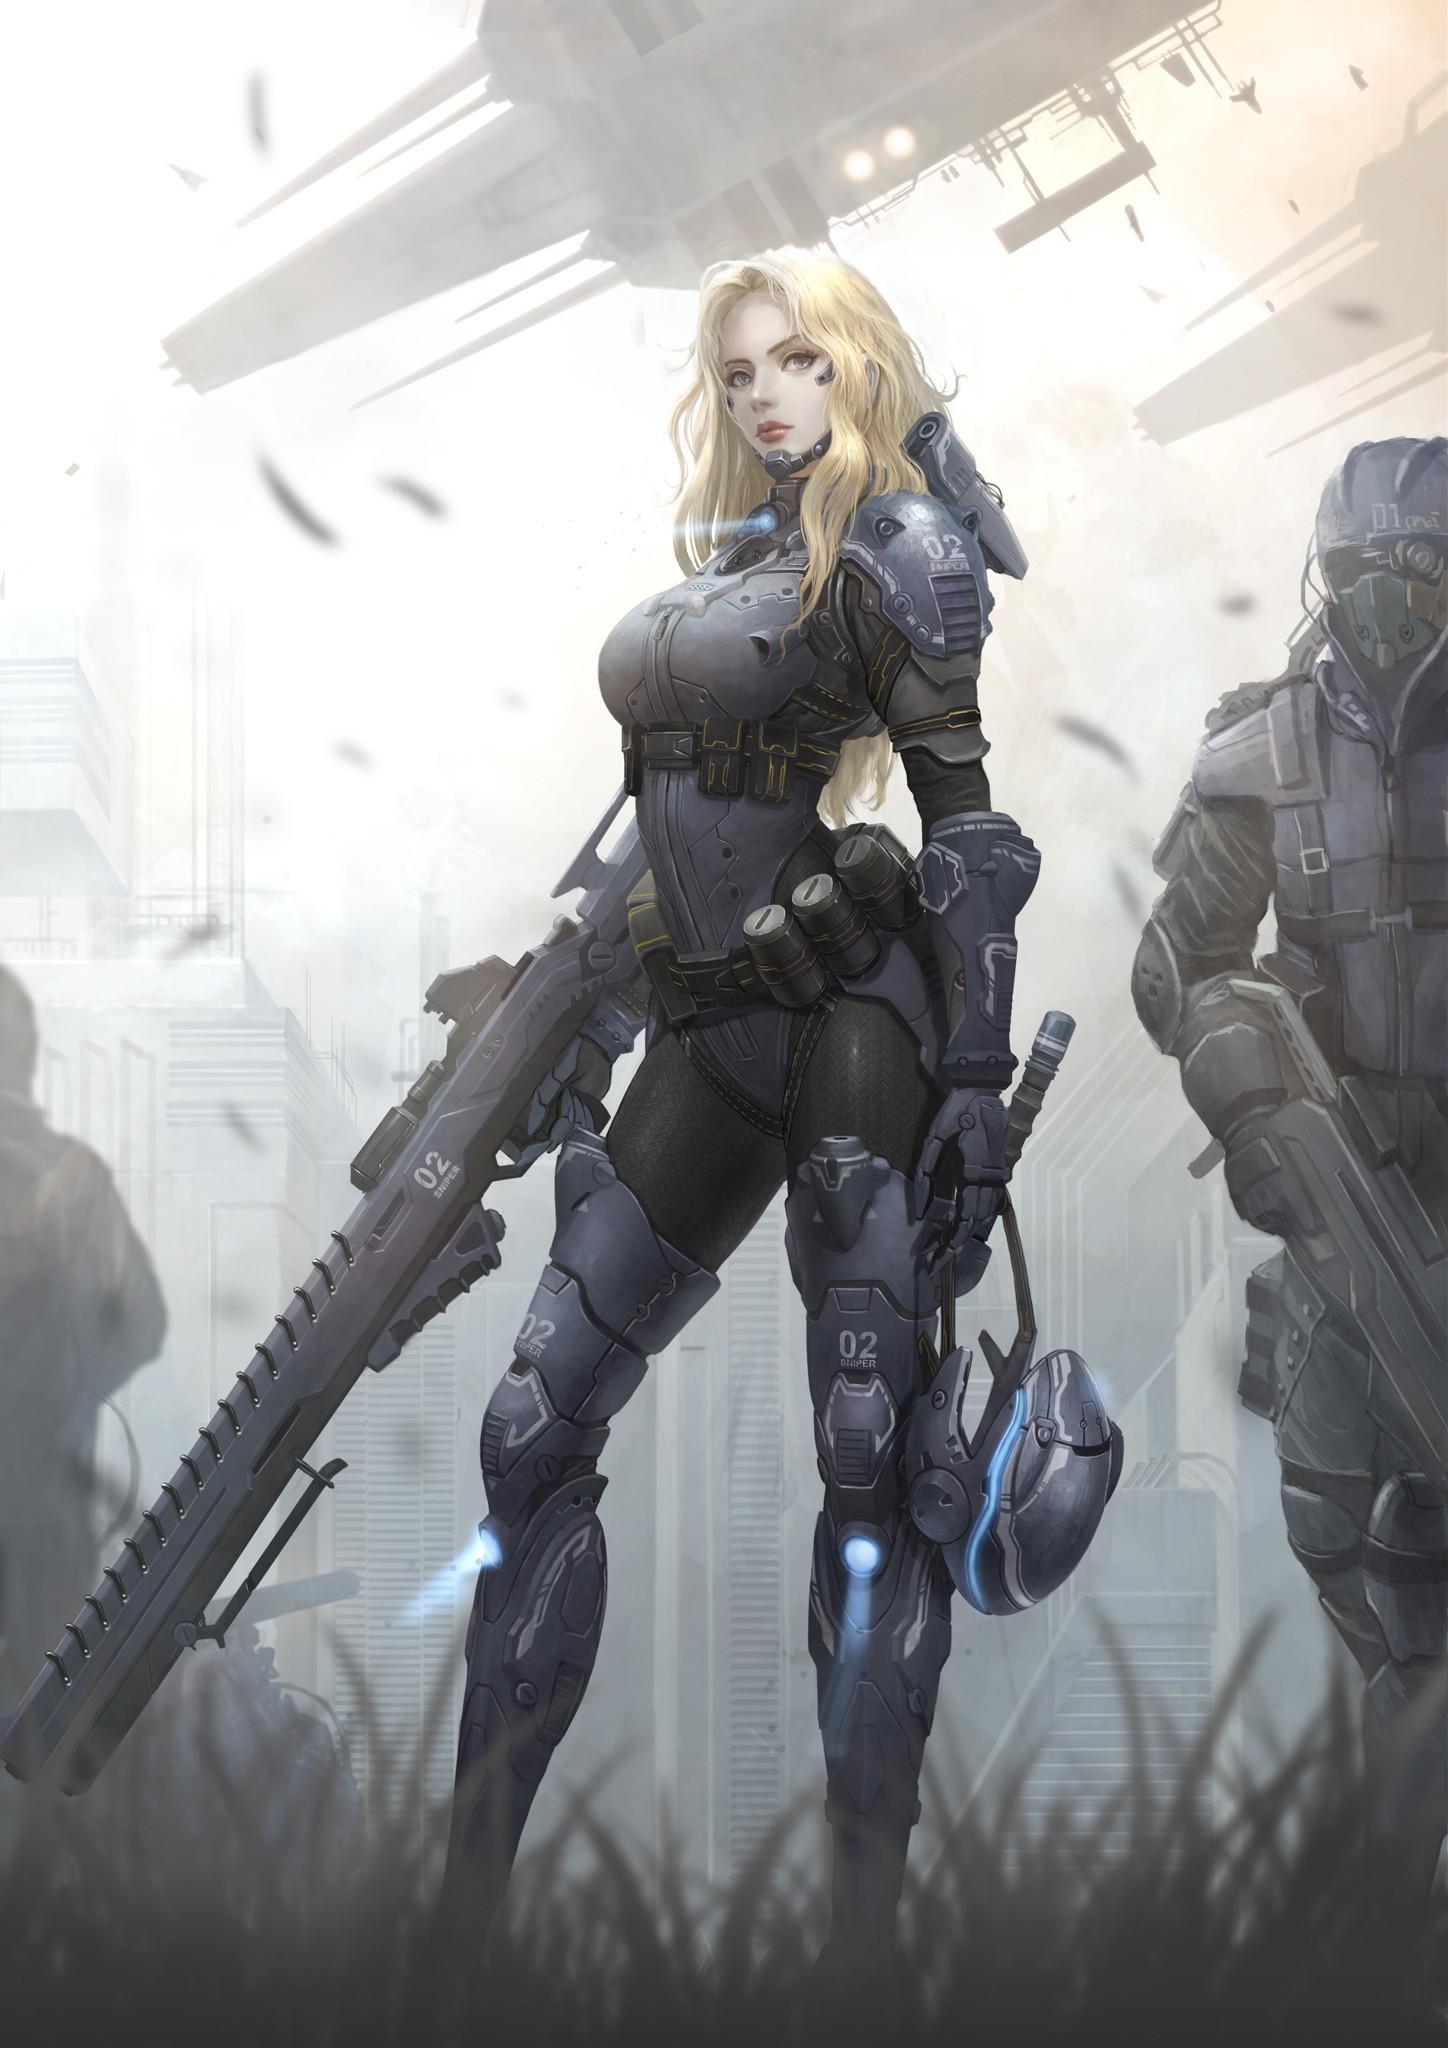 Anime 1448x2048 anime girls portrait display futuristic futuristic armor science fiction